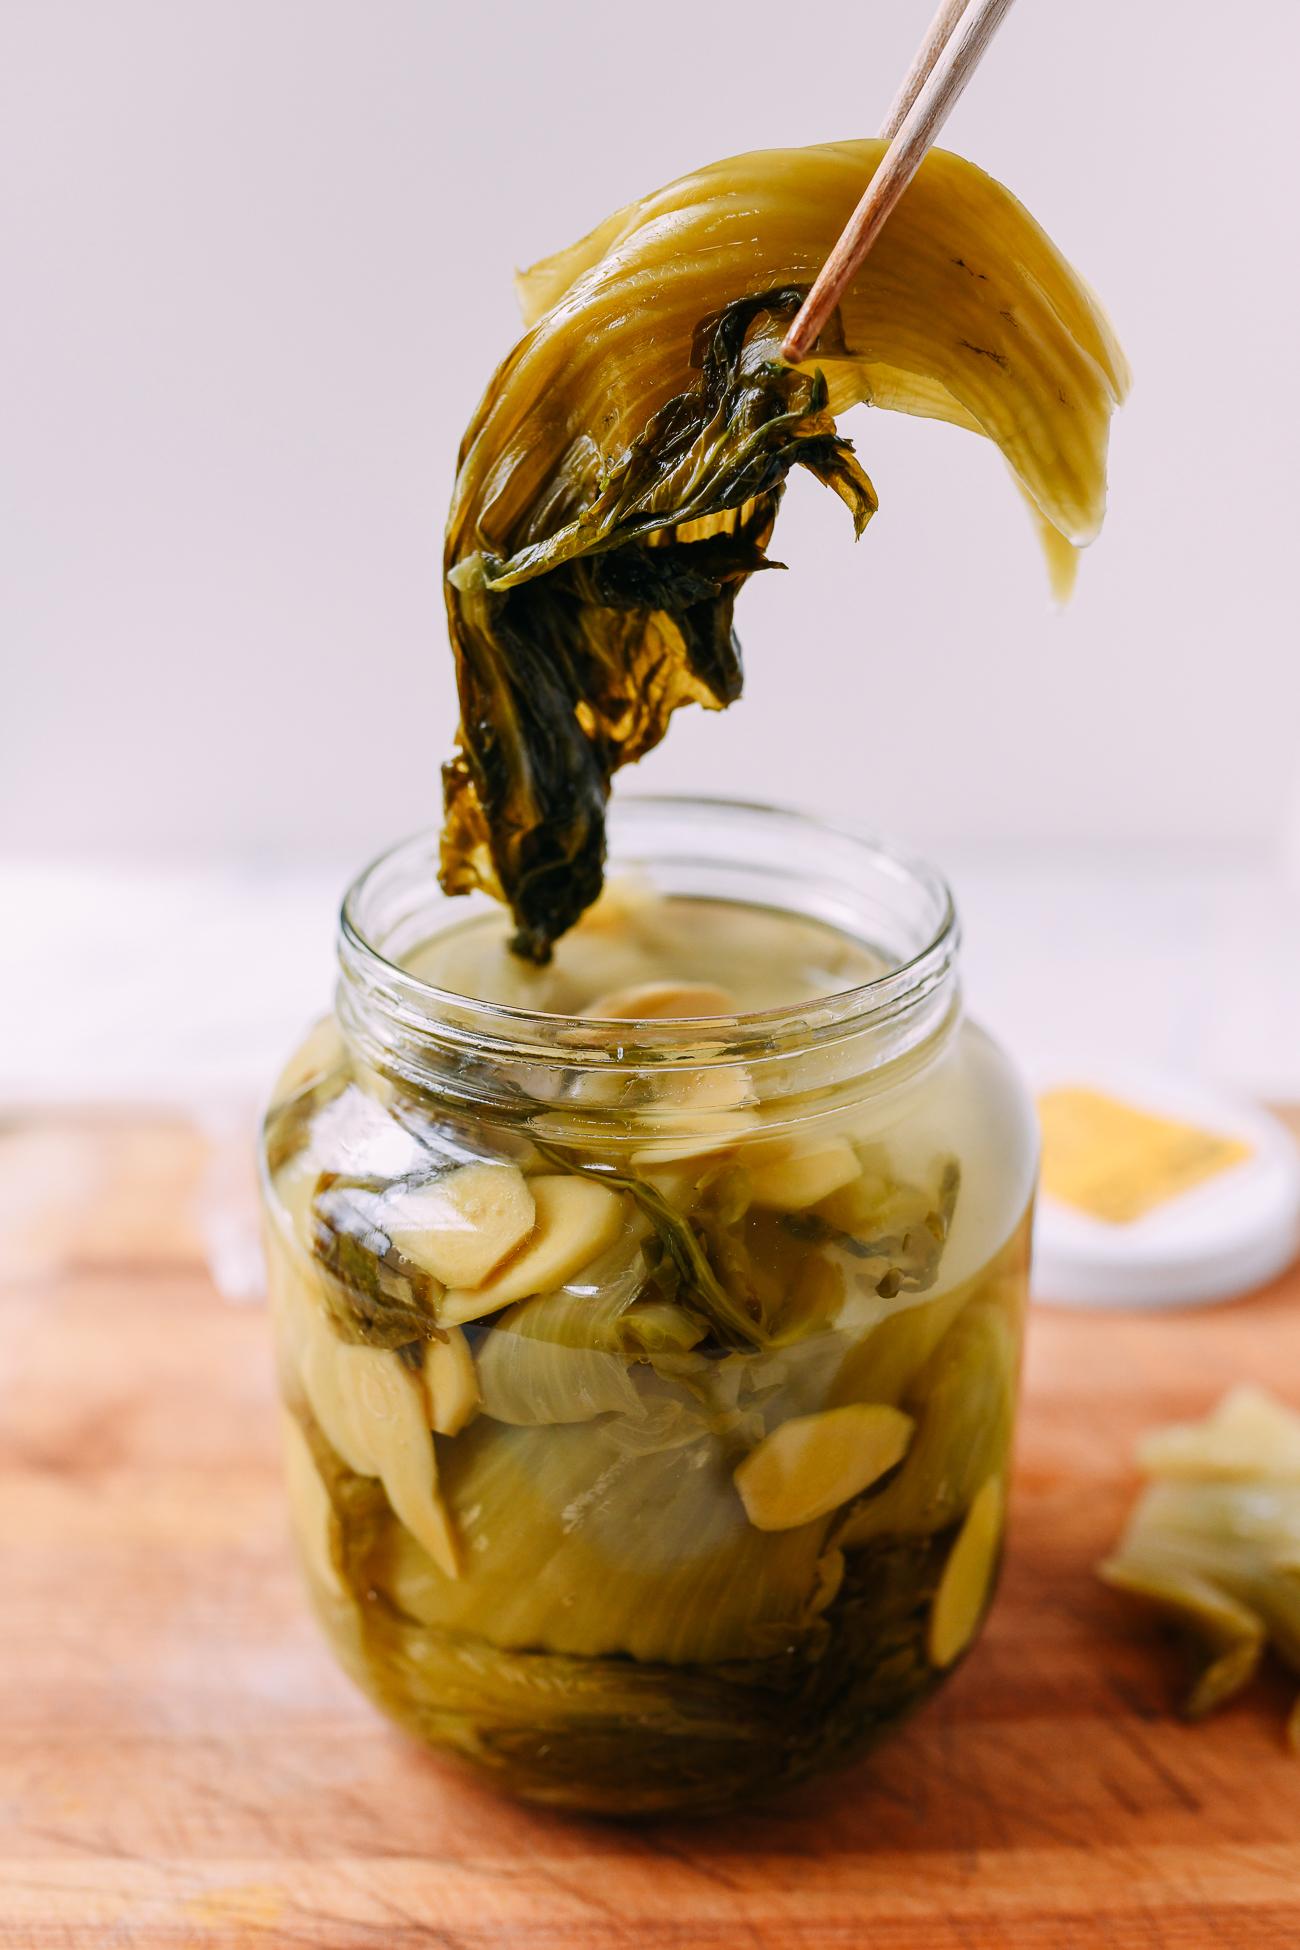 Removing pickled mustard greens from jar